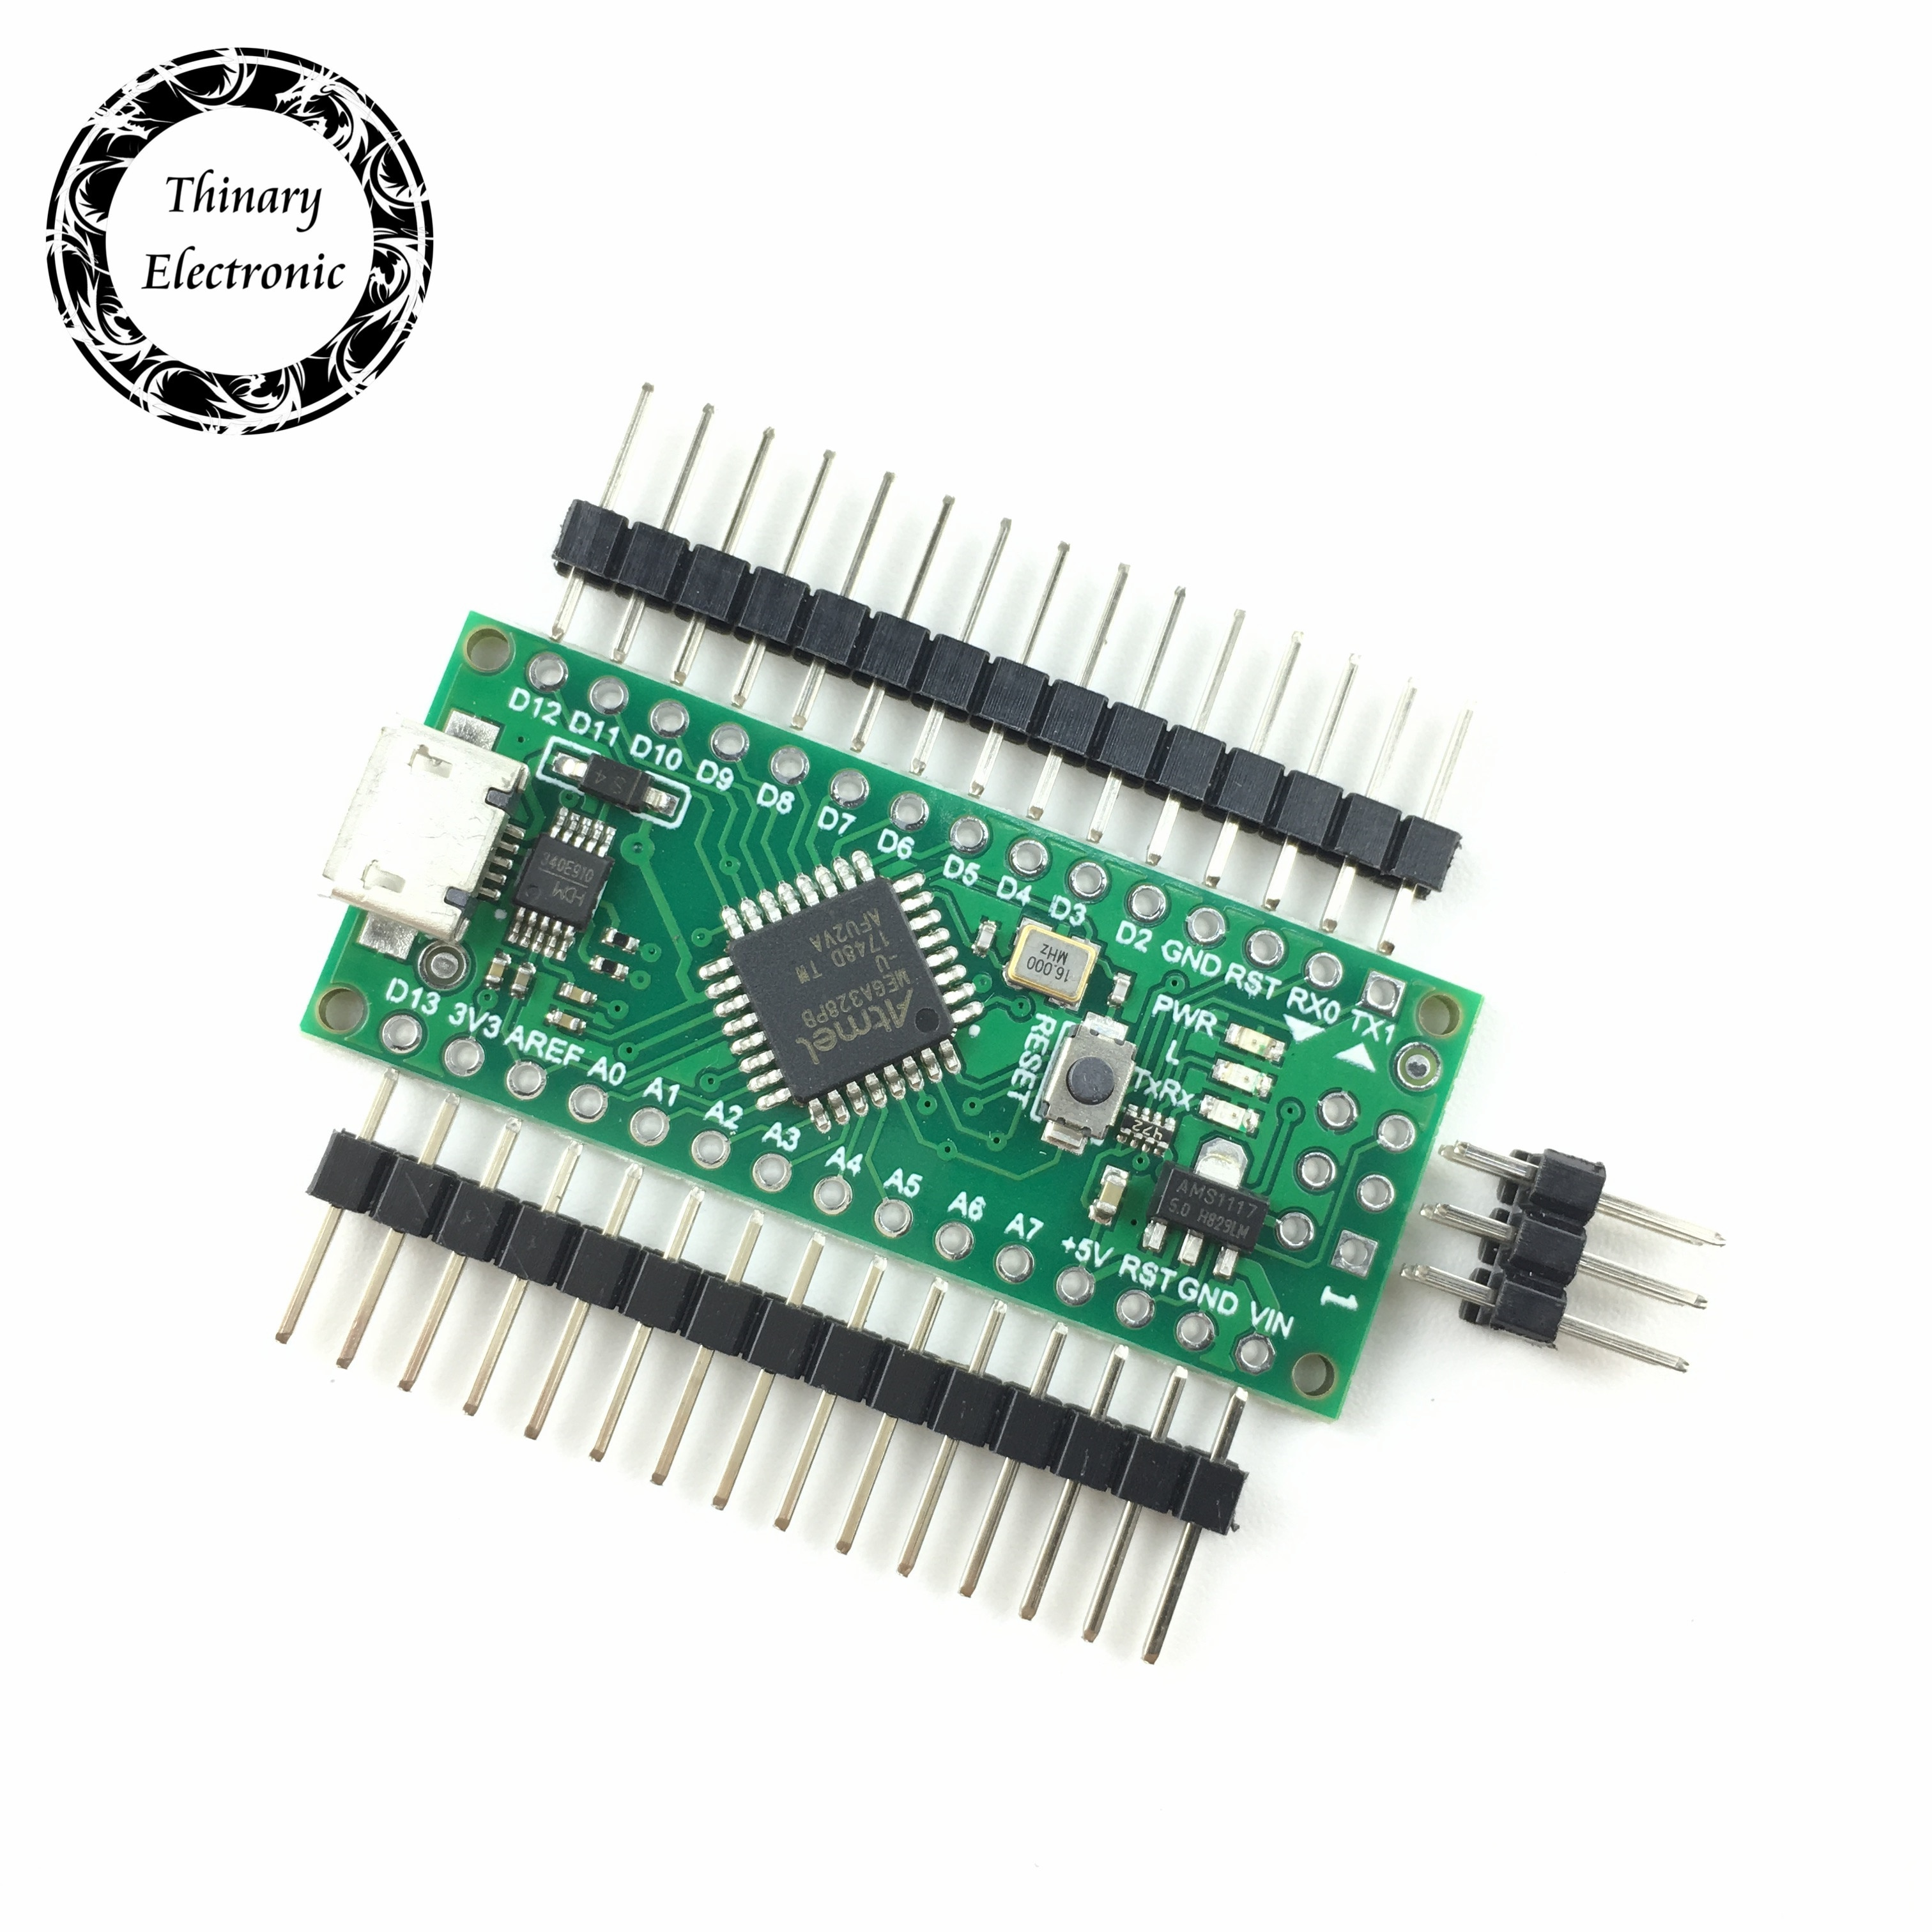 Gran oferta Nano 3,0 controlador compatible con arduino nano Atmega328 serie CH340 controlador USB con CABLE NANO V3.0